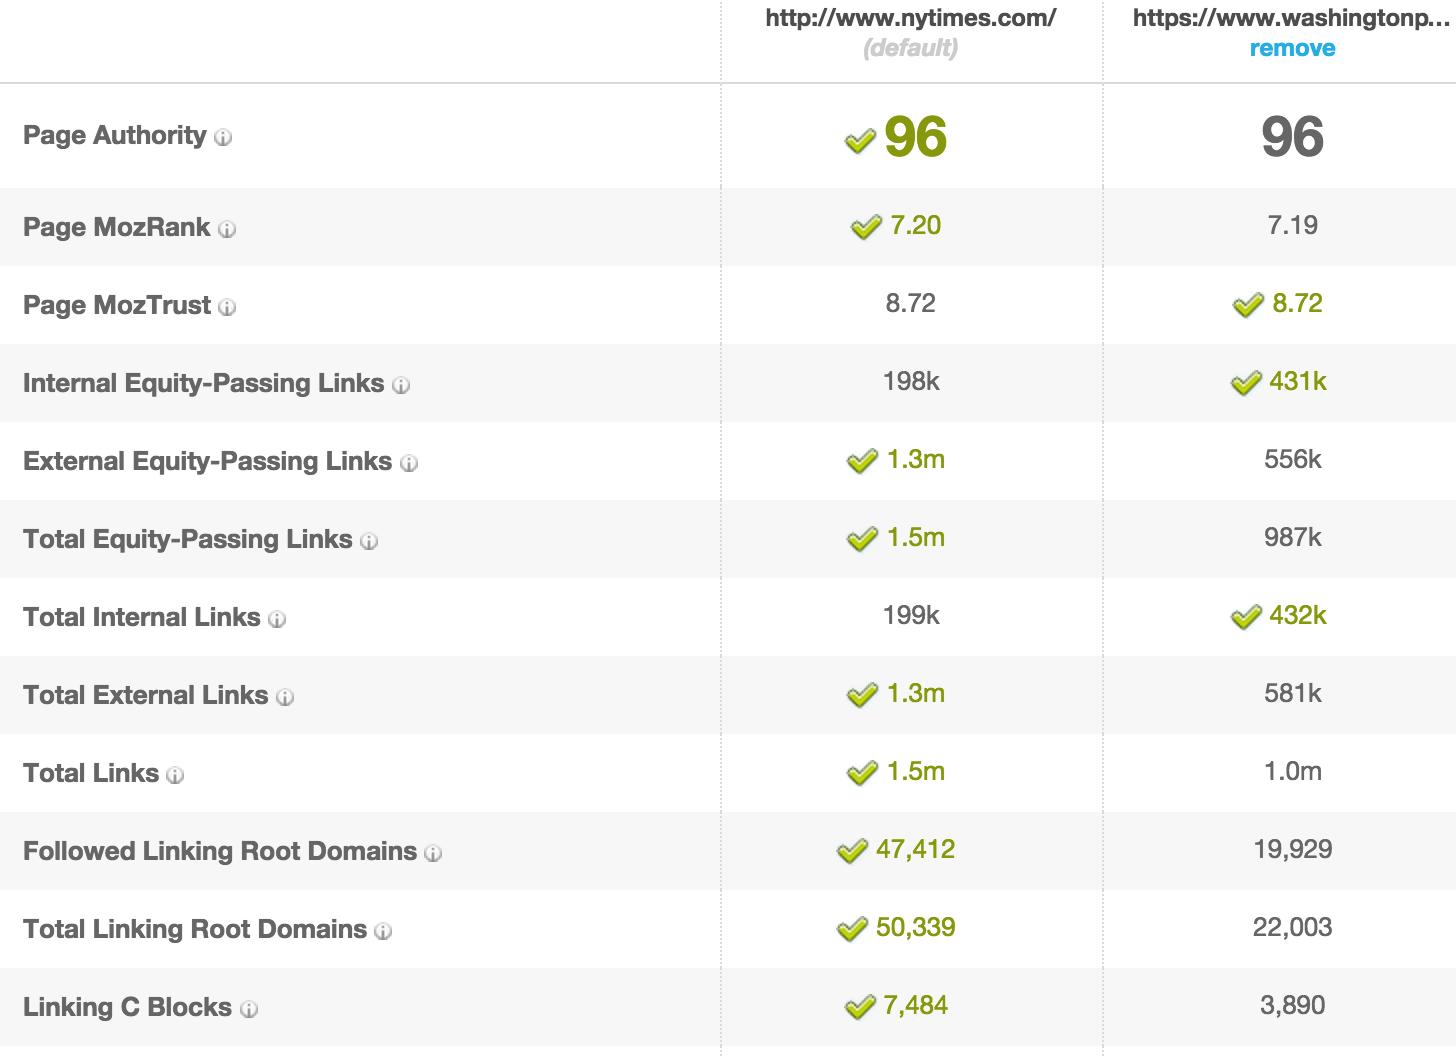 comparing link metrics